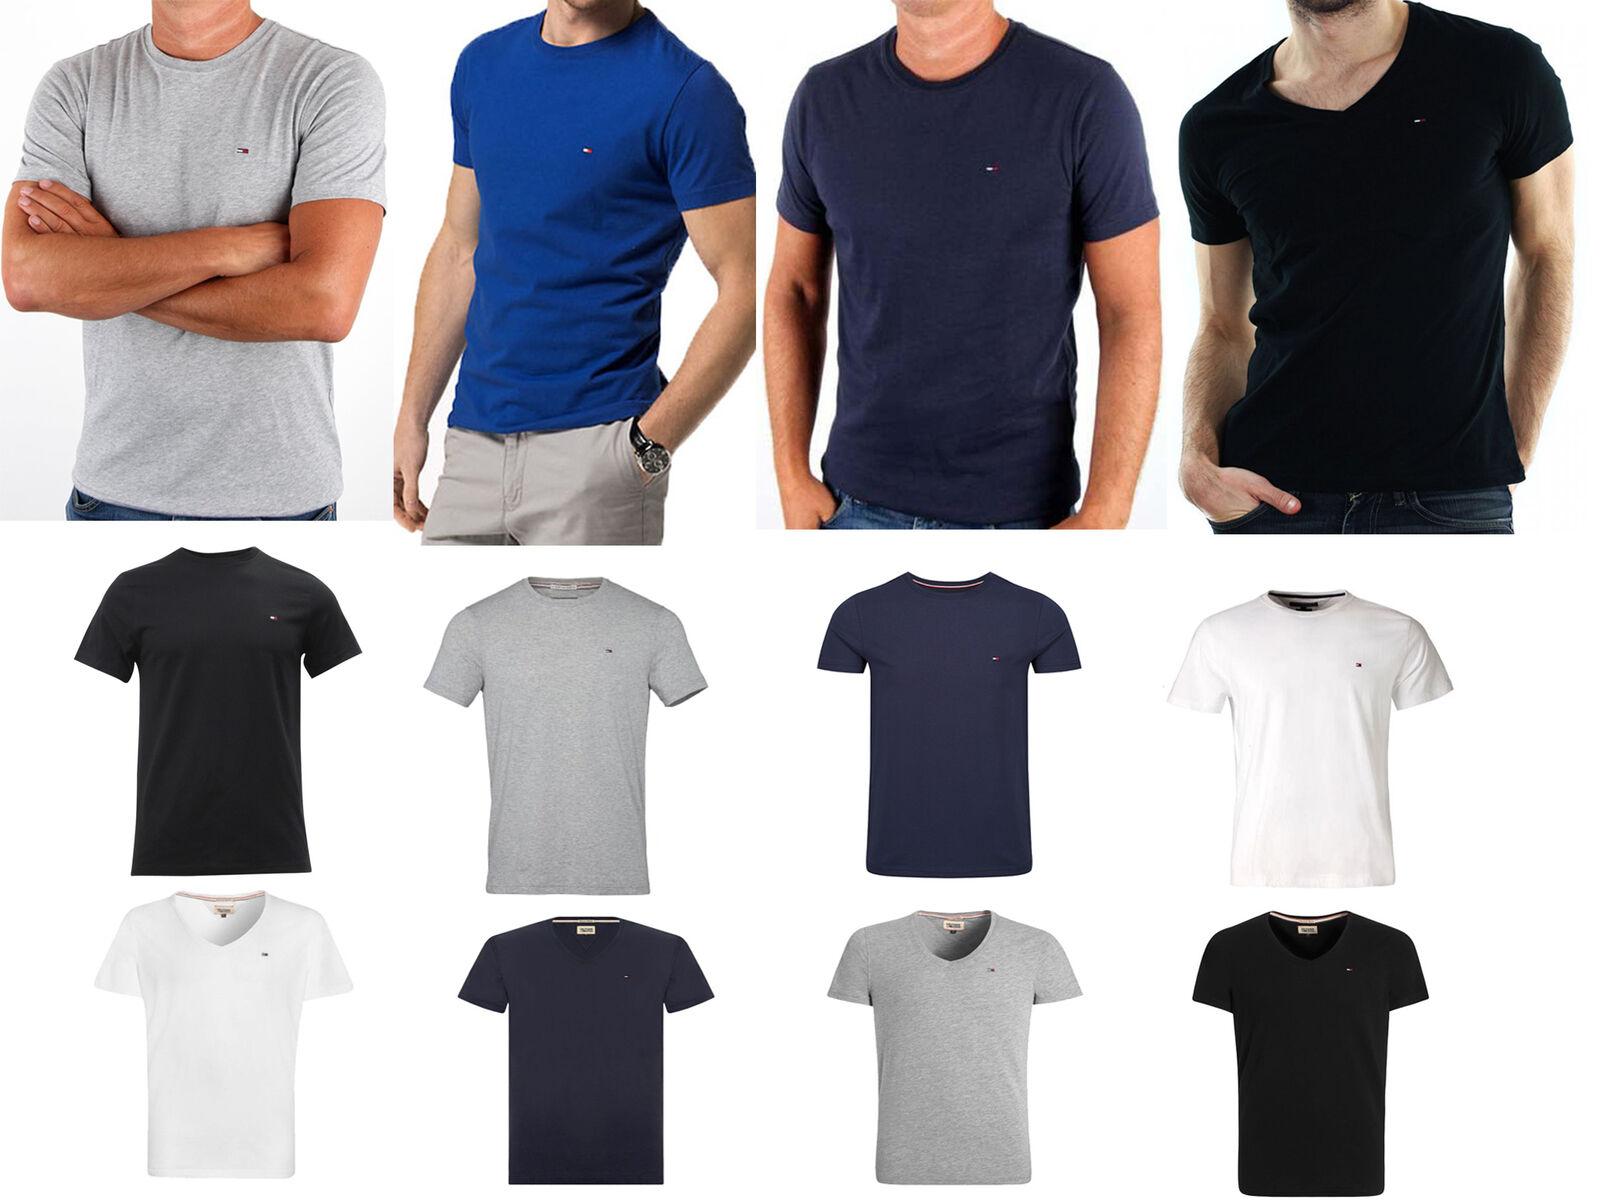 Tommy Hilfiger Denim T Shirt Herren V Neck Rundschnitt Rundhals Neu &OVP